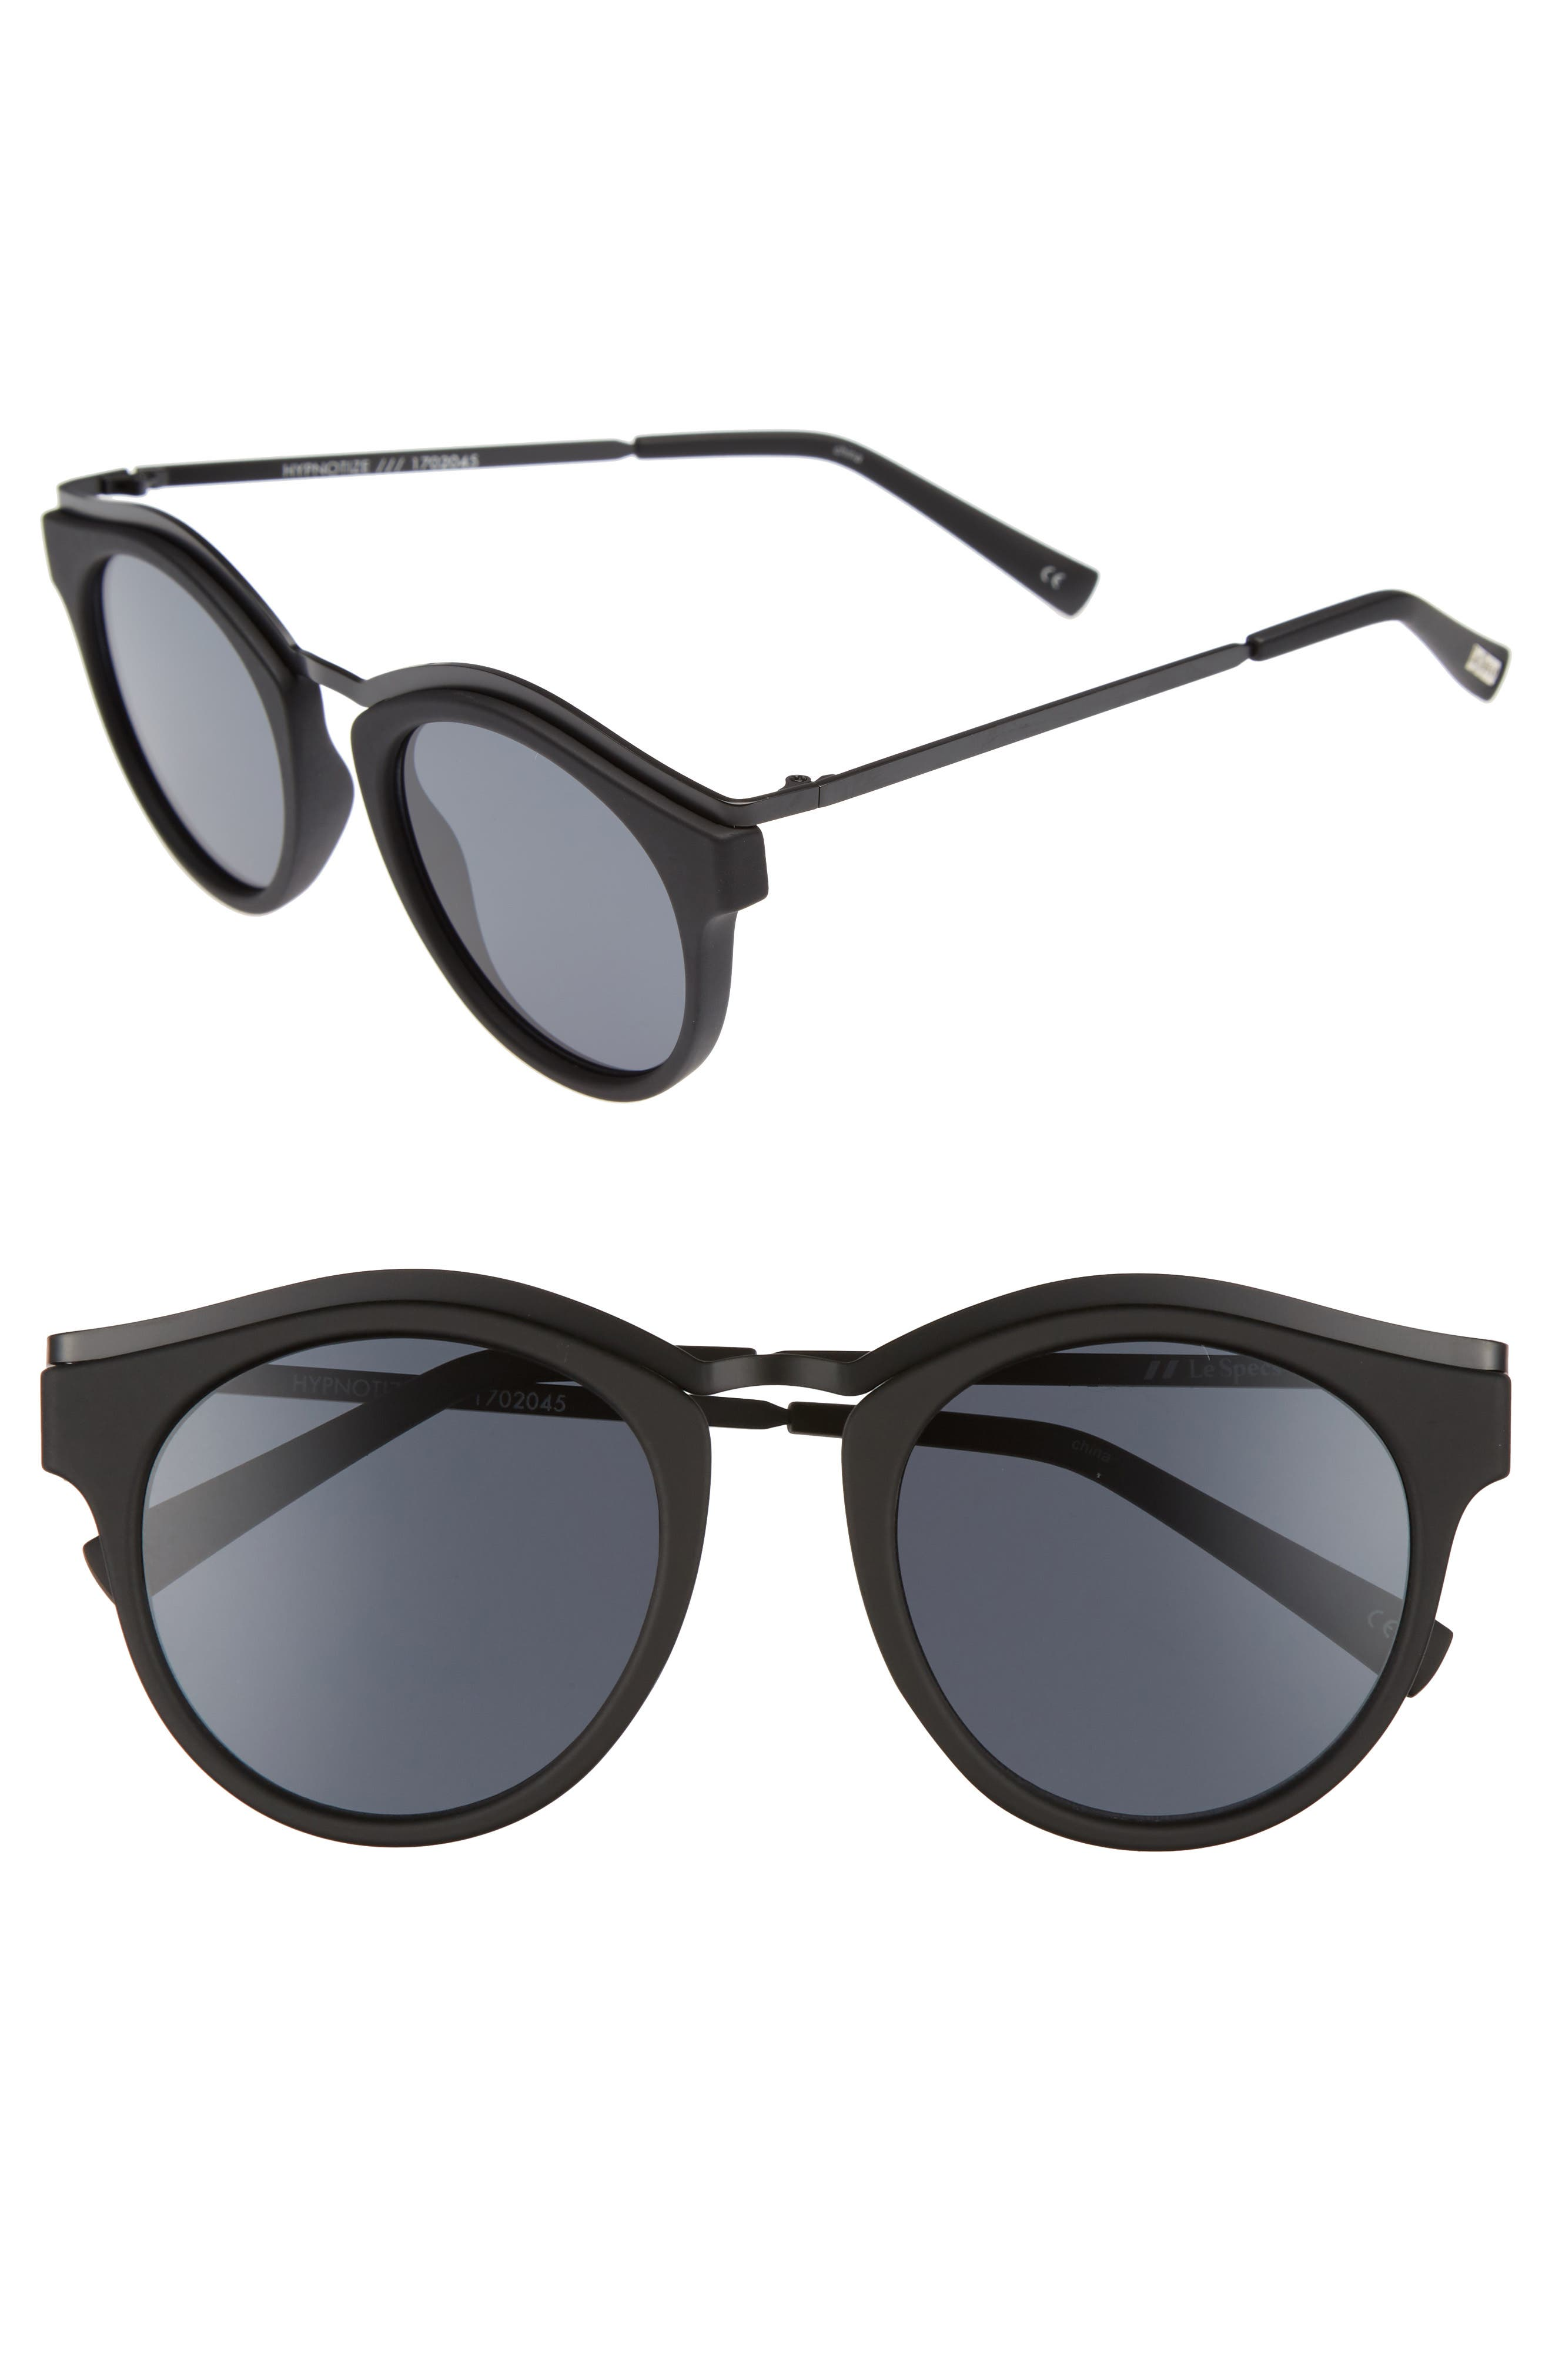 Hypnotize 50mm Round Sunglasses,                         Main,                         color, Black Rubber